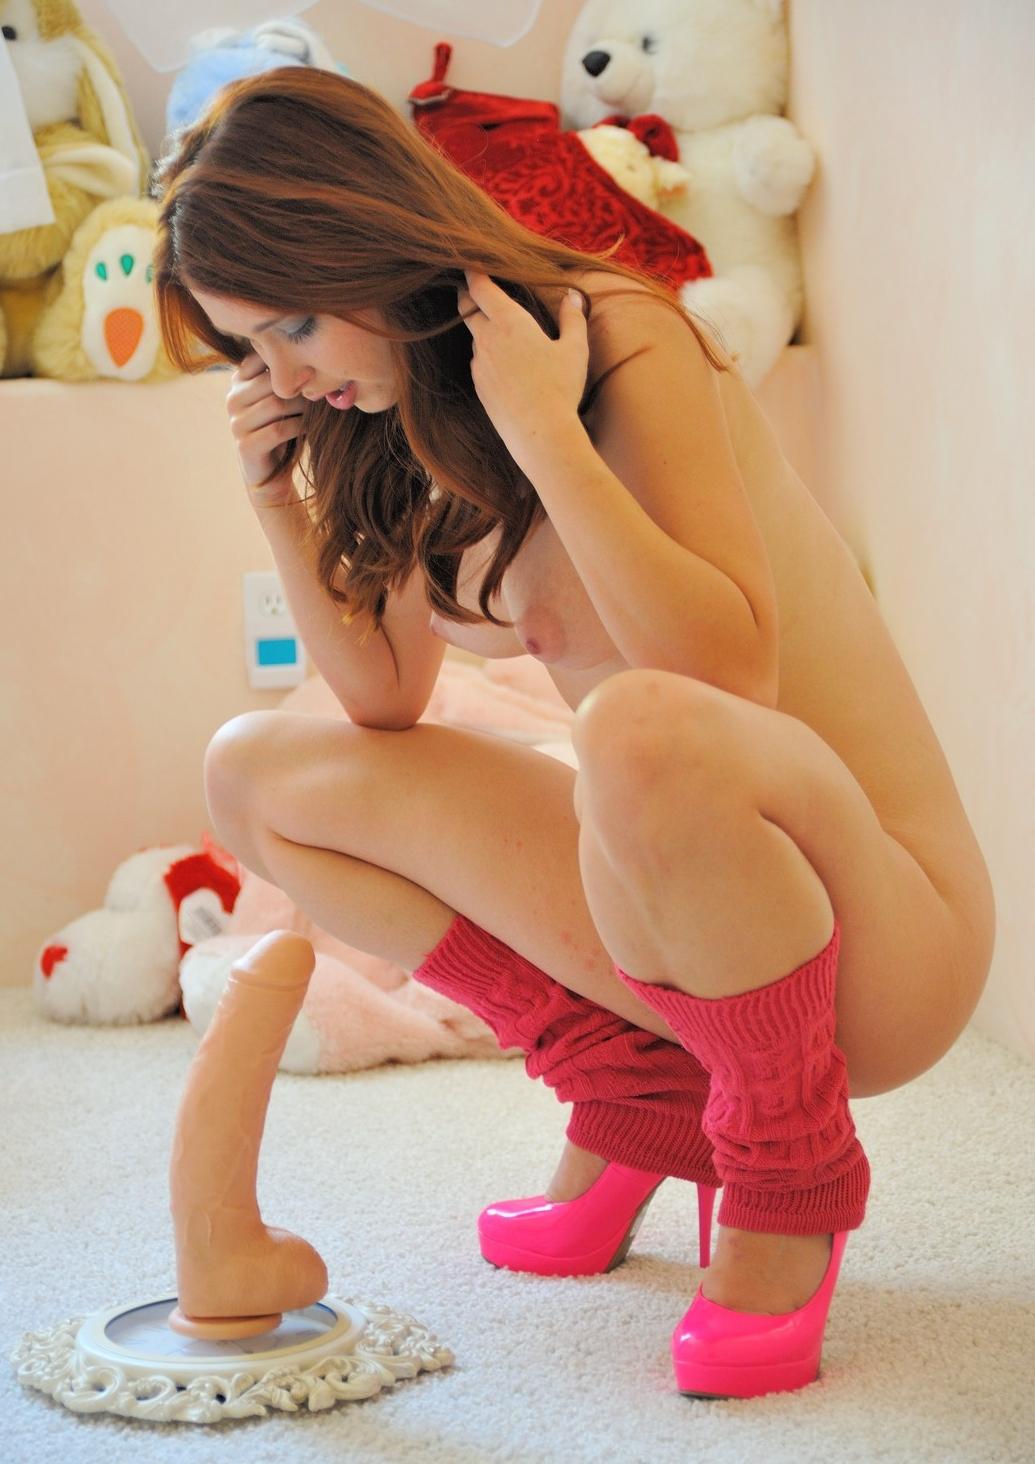 kannadikas-nude-girls-with-leg-warmers-nude-young